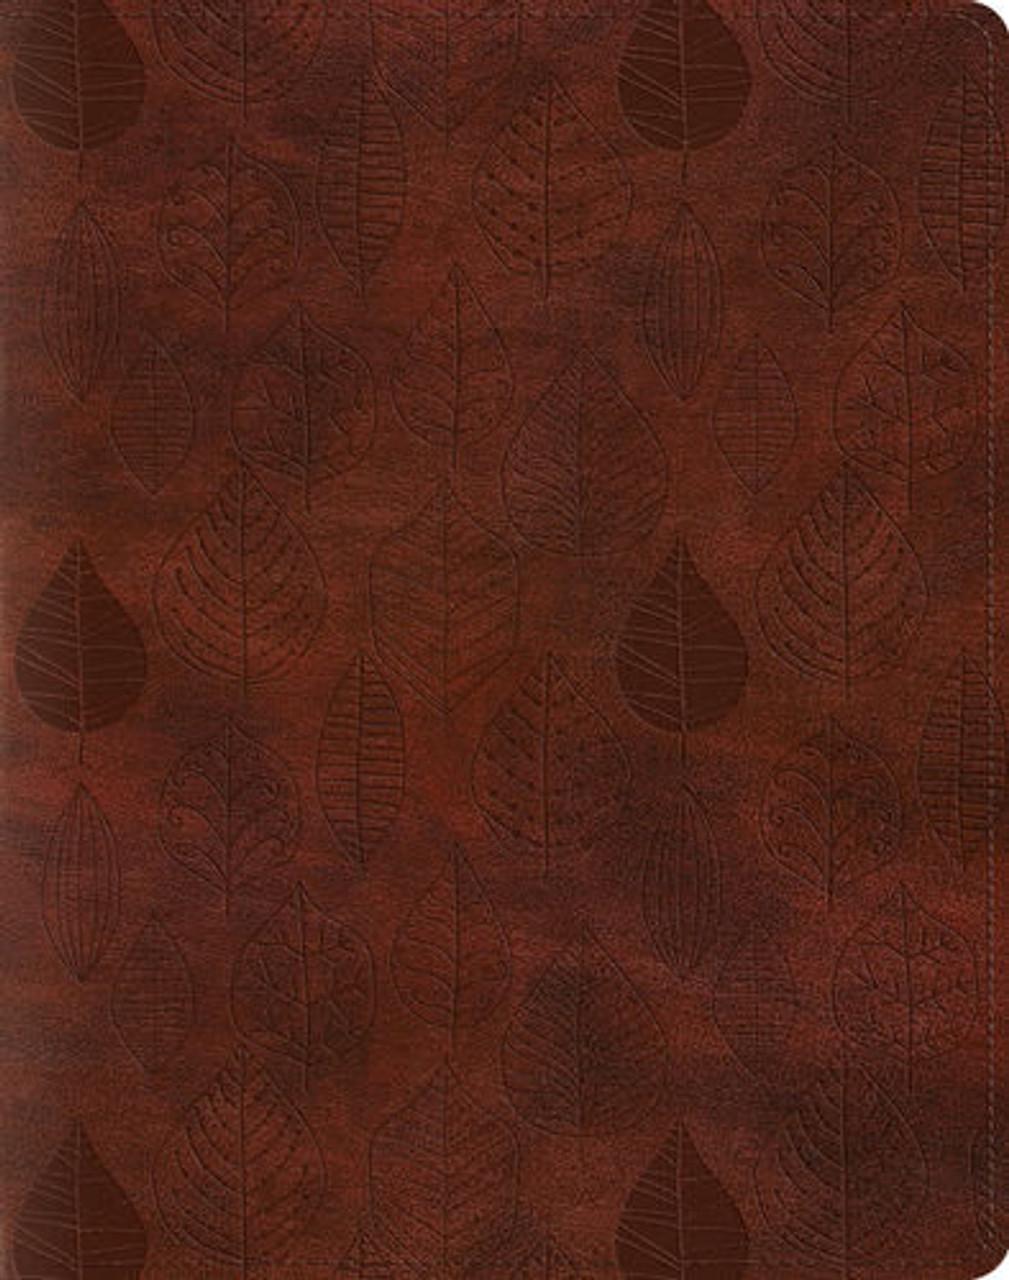 Leaves Design, ESV Single Column Journaling Bible (TruTone, Chestnut), Bible Journaling, for Bible Journaling